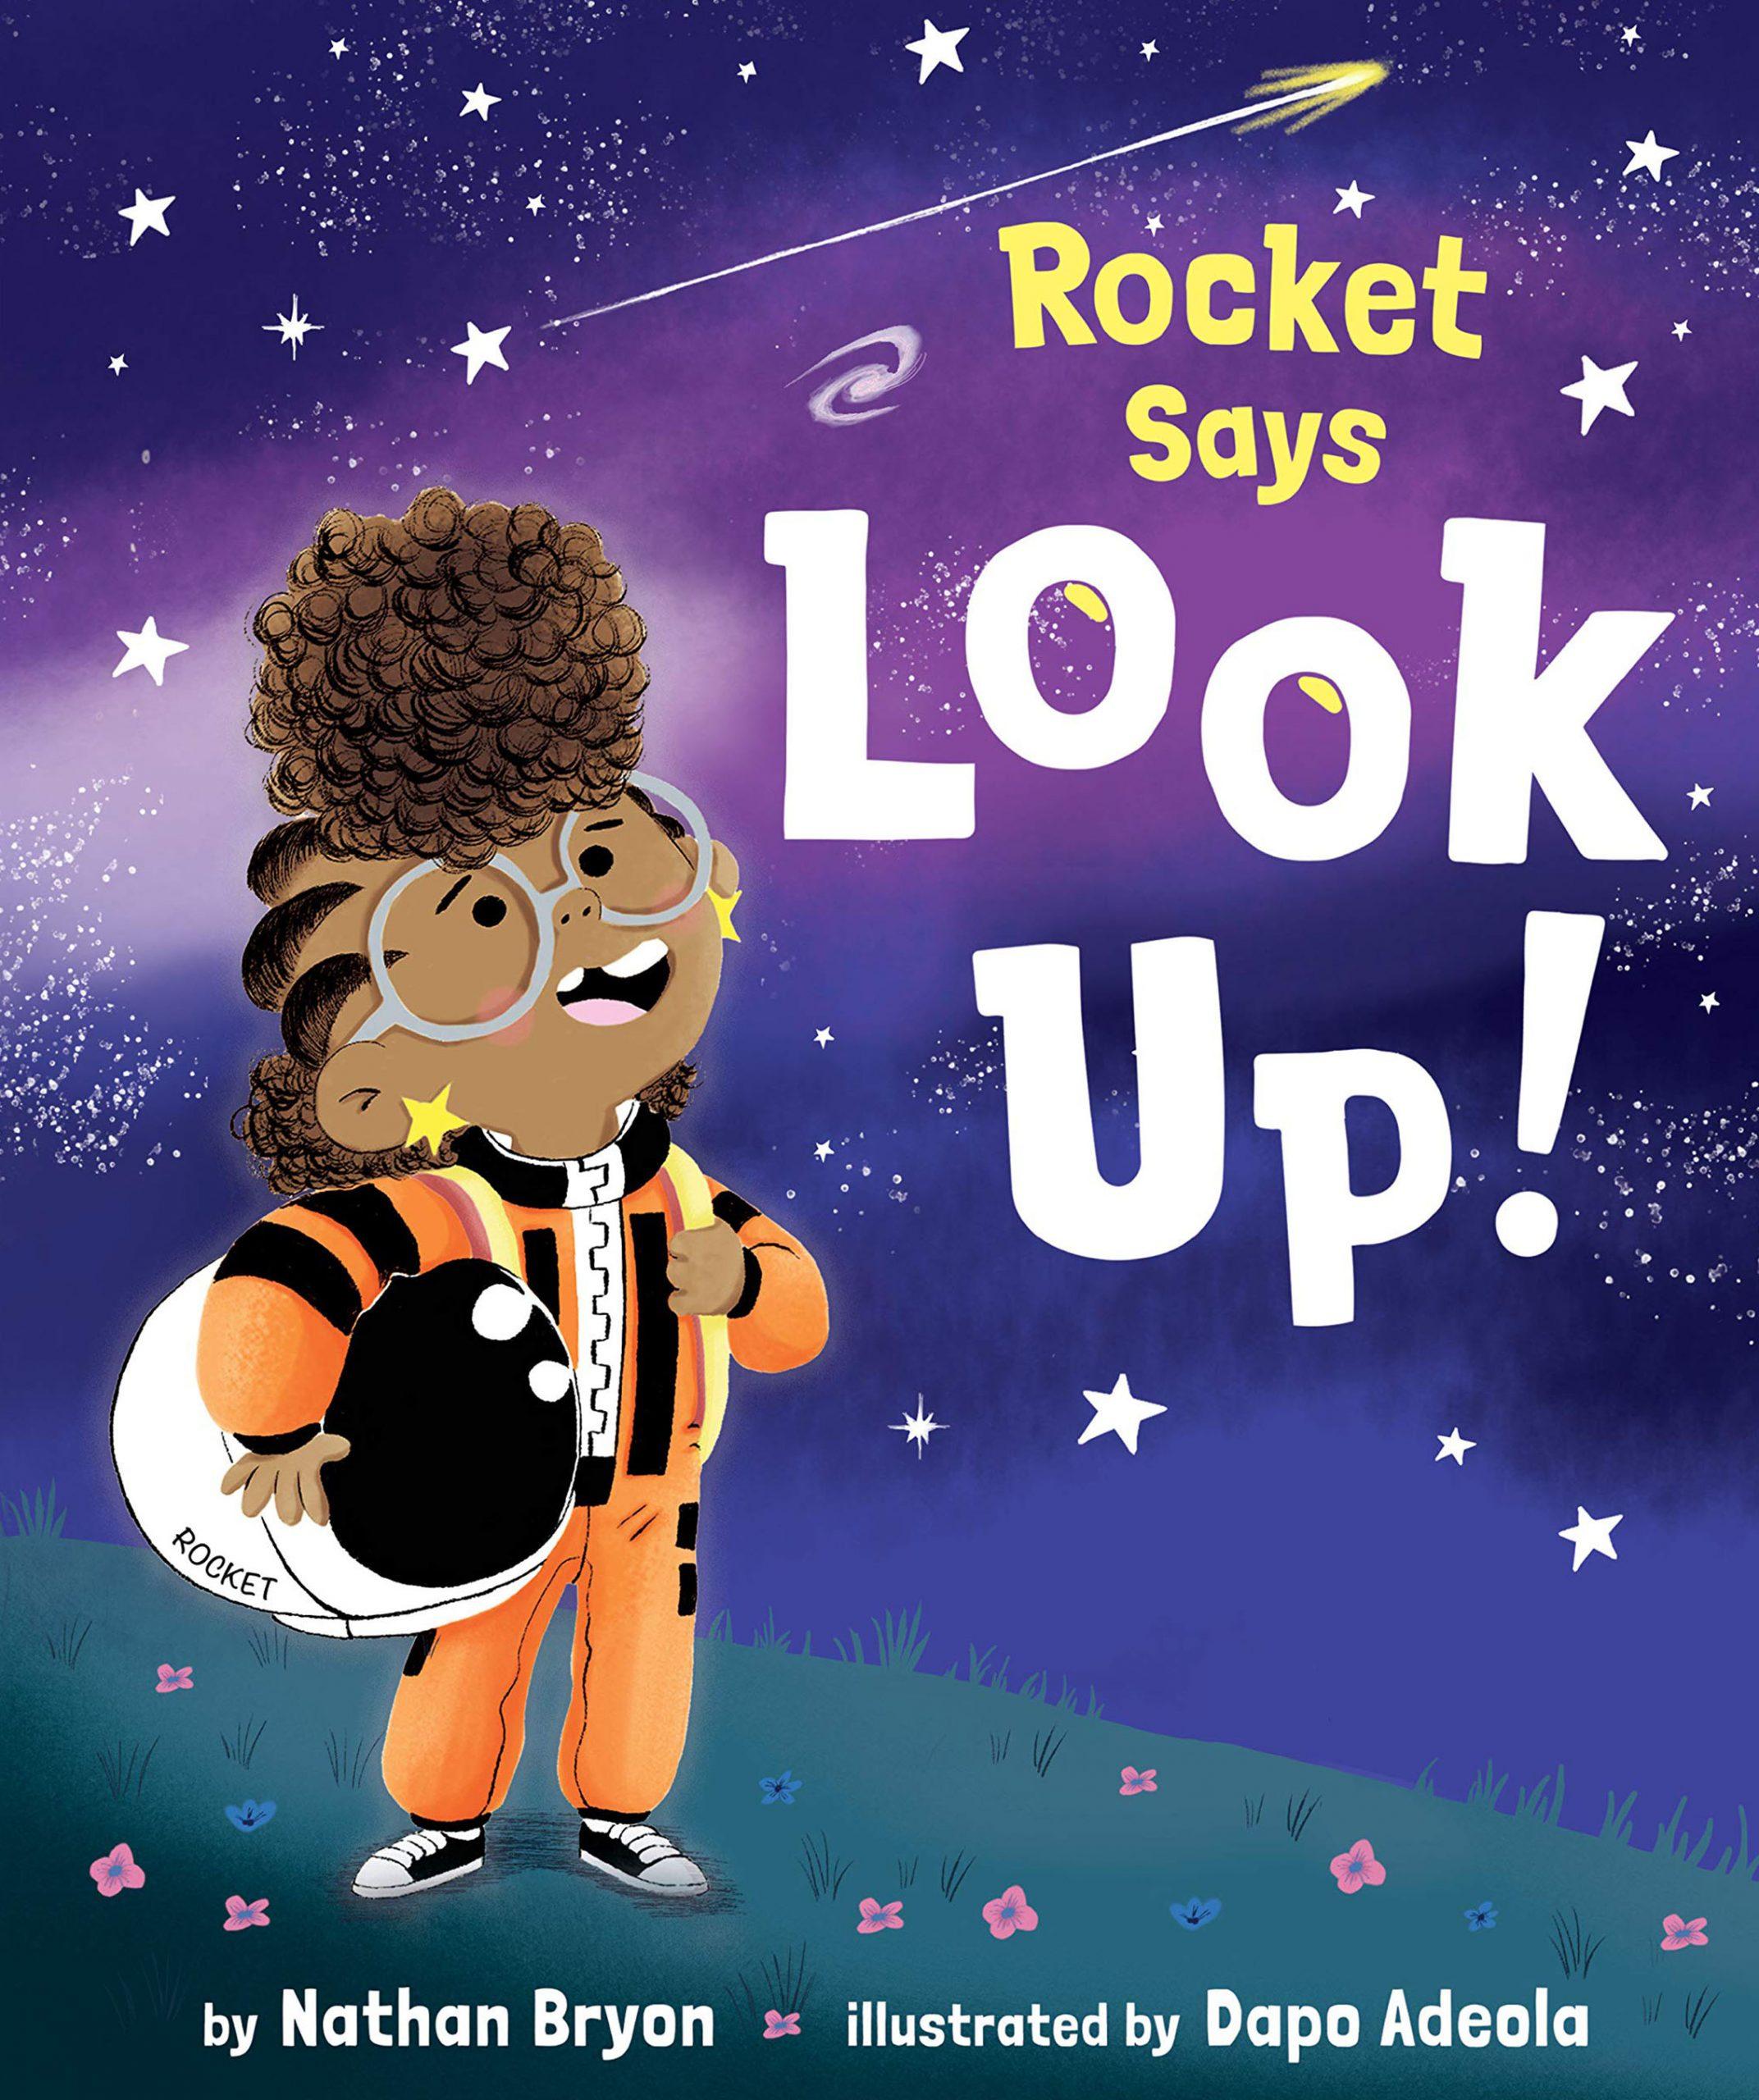 Rocket Says Look Up! by Nathan Byron